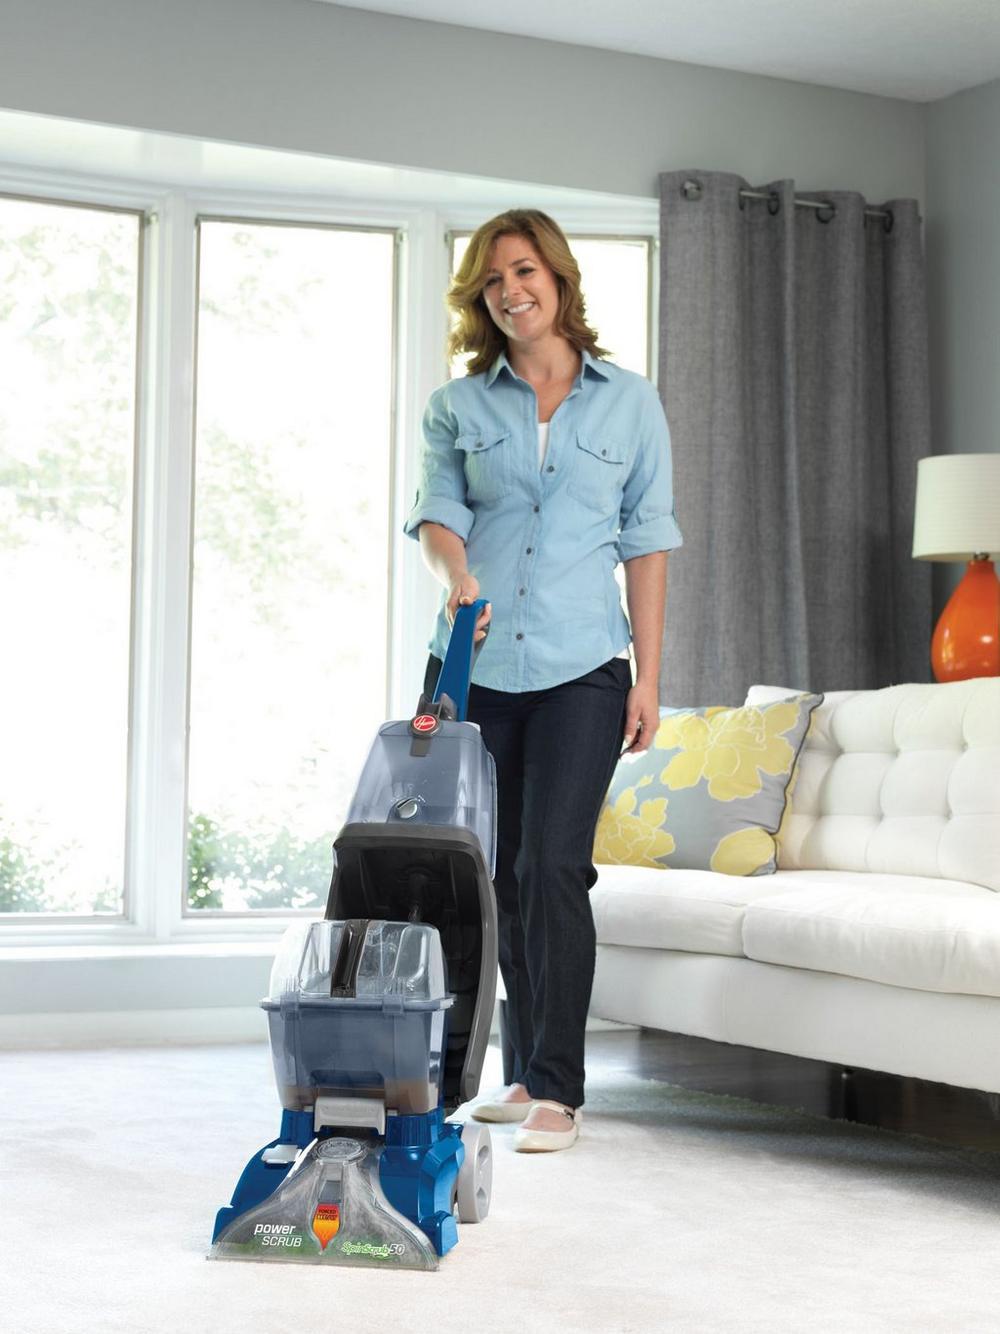 Power Scrub Carpet Cleaner3